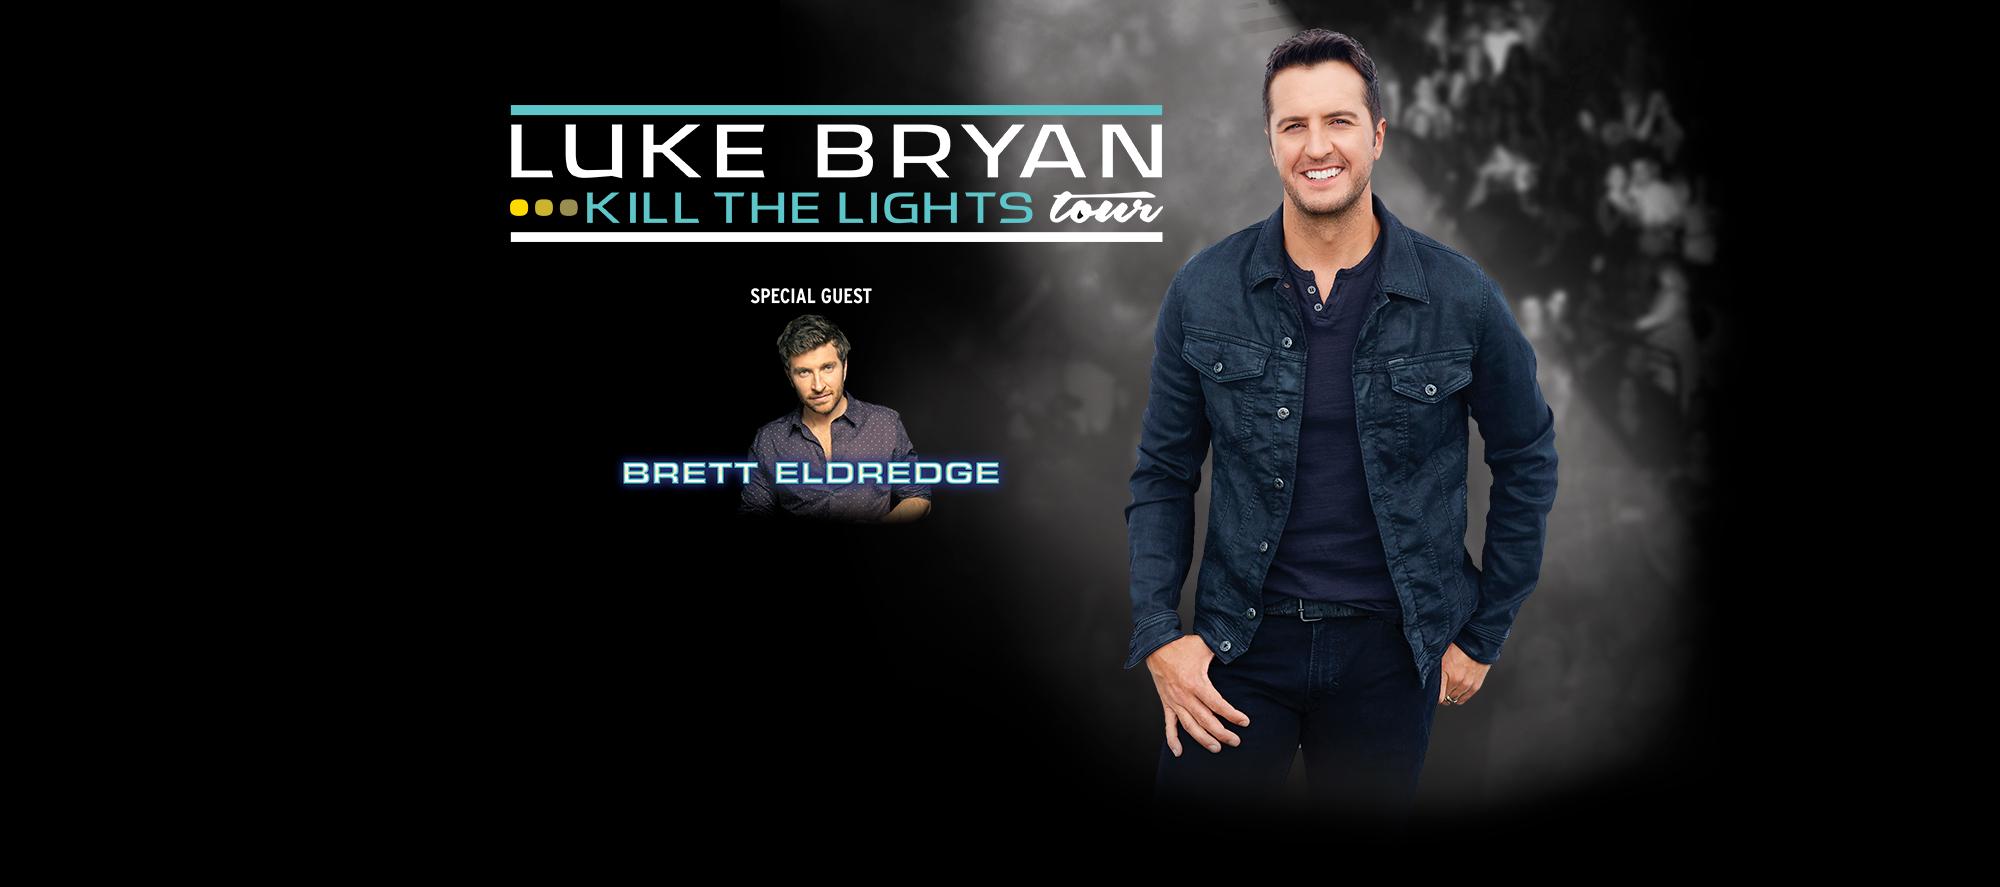 Luke Bryan Kill the Lights Tour 2017